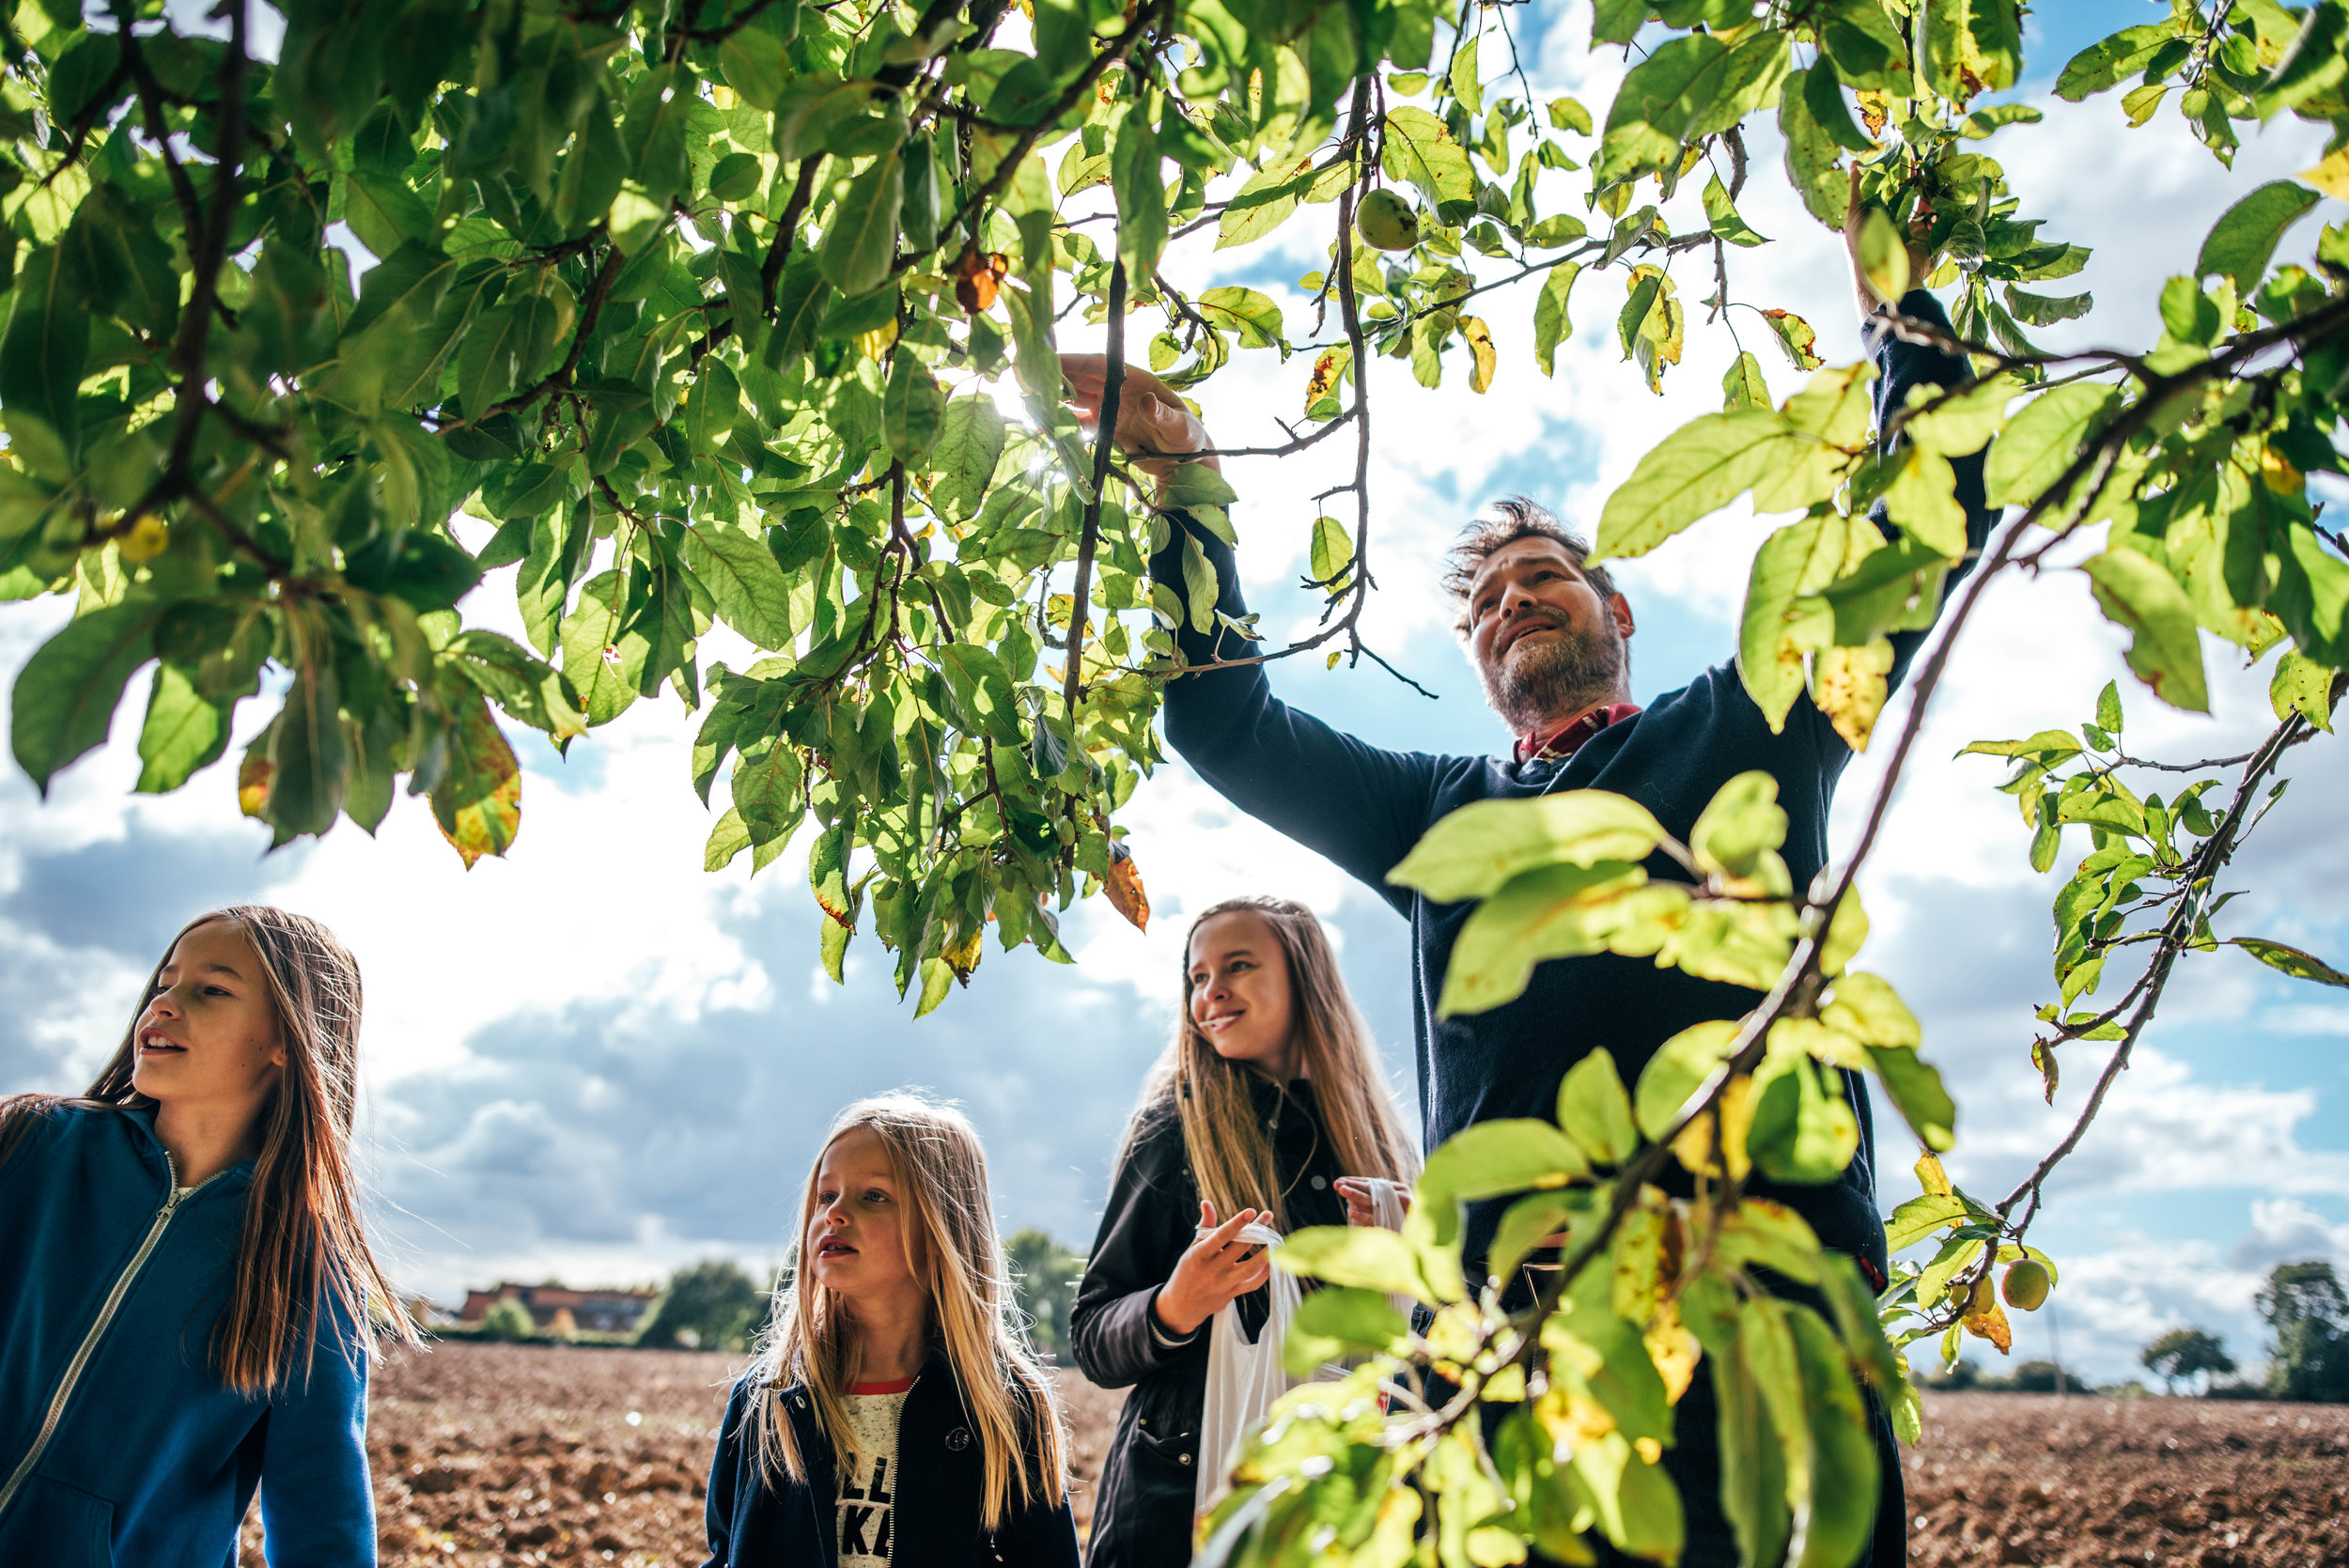 Family pick apples from tree Essex UK Documentary Portrait Photographer